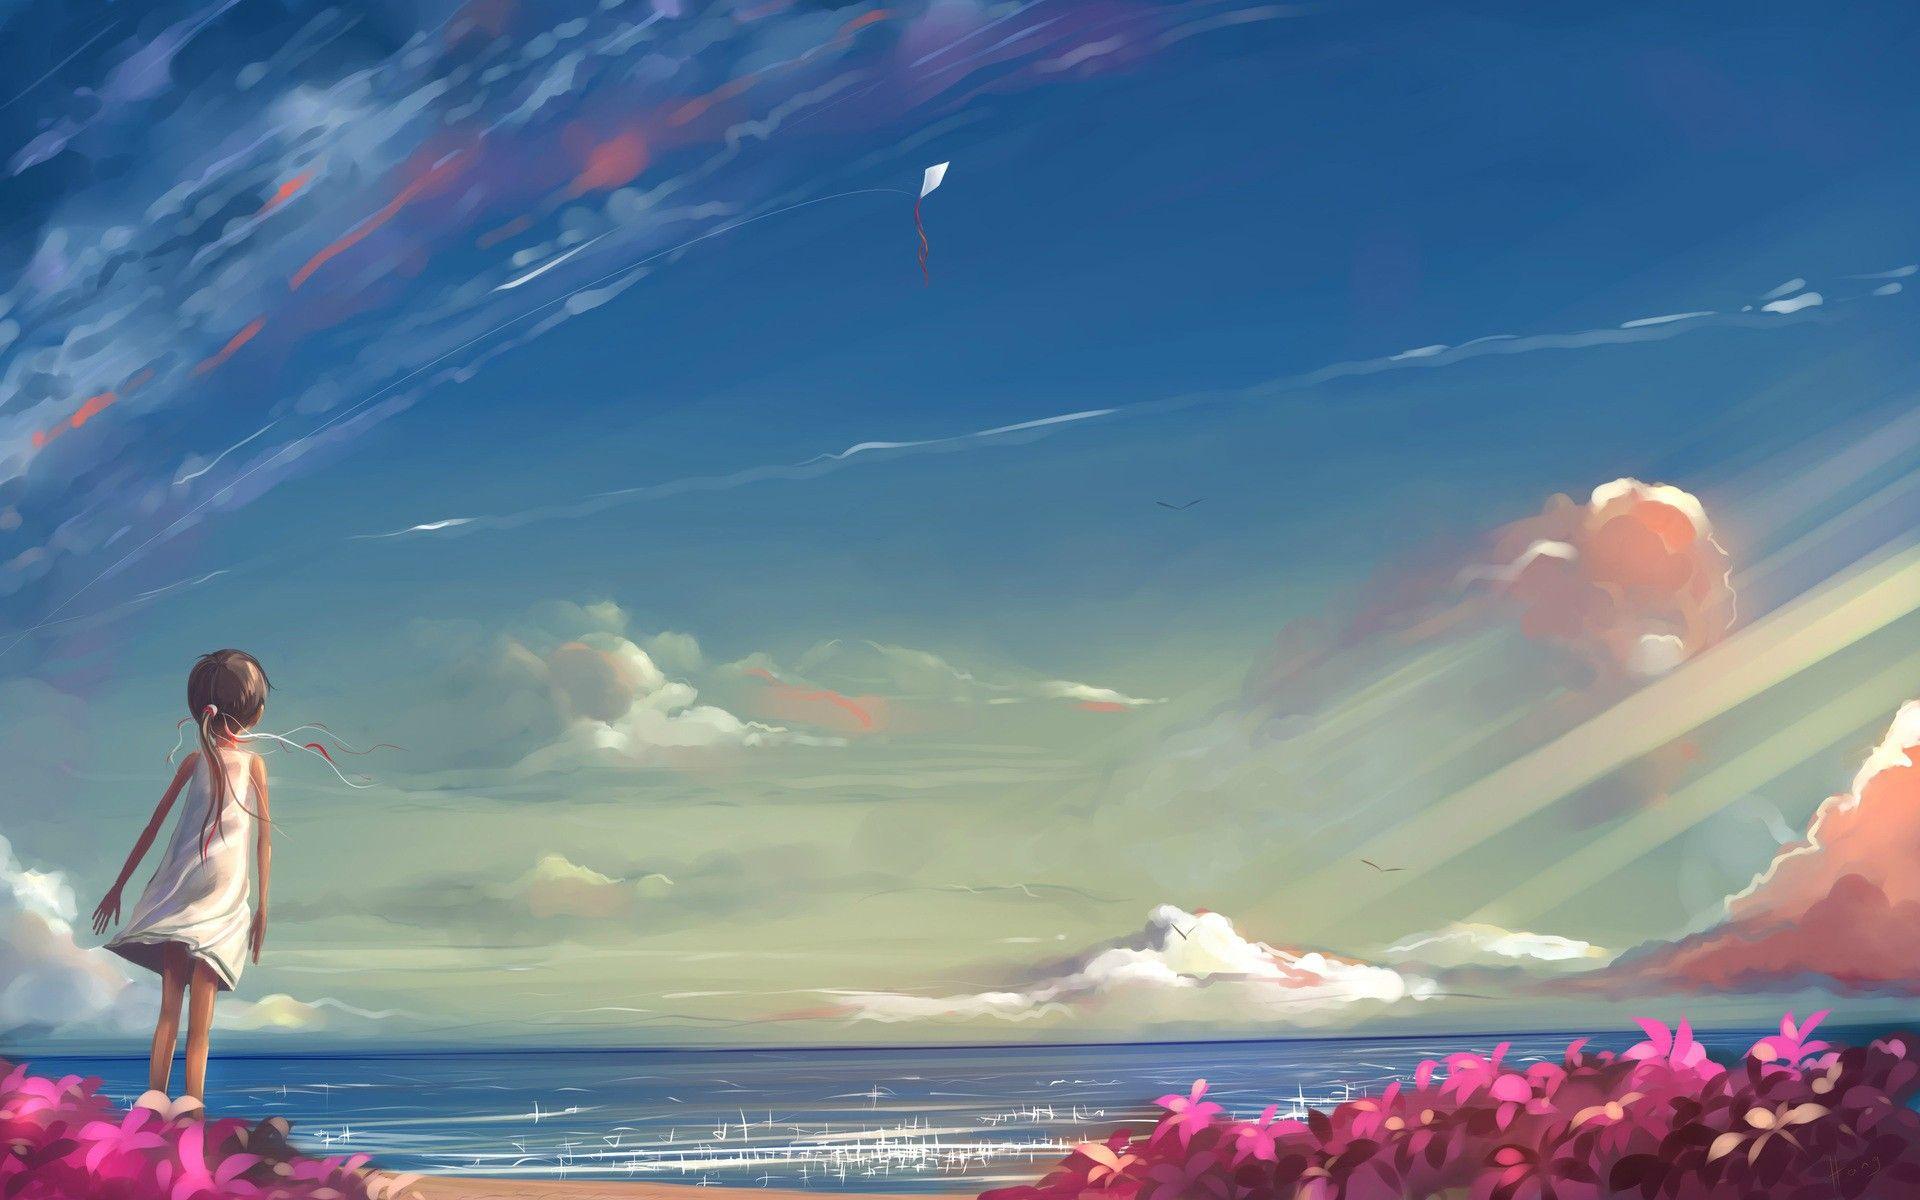 Anime Phong Cảnh Anime Scenery Wallpaper Anime Scenery Scenery Wallpaper